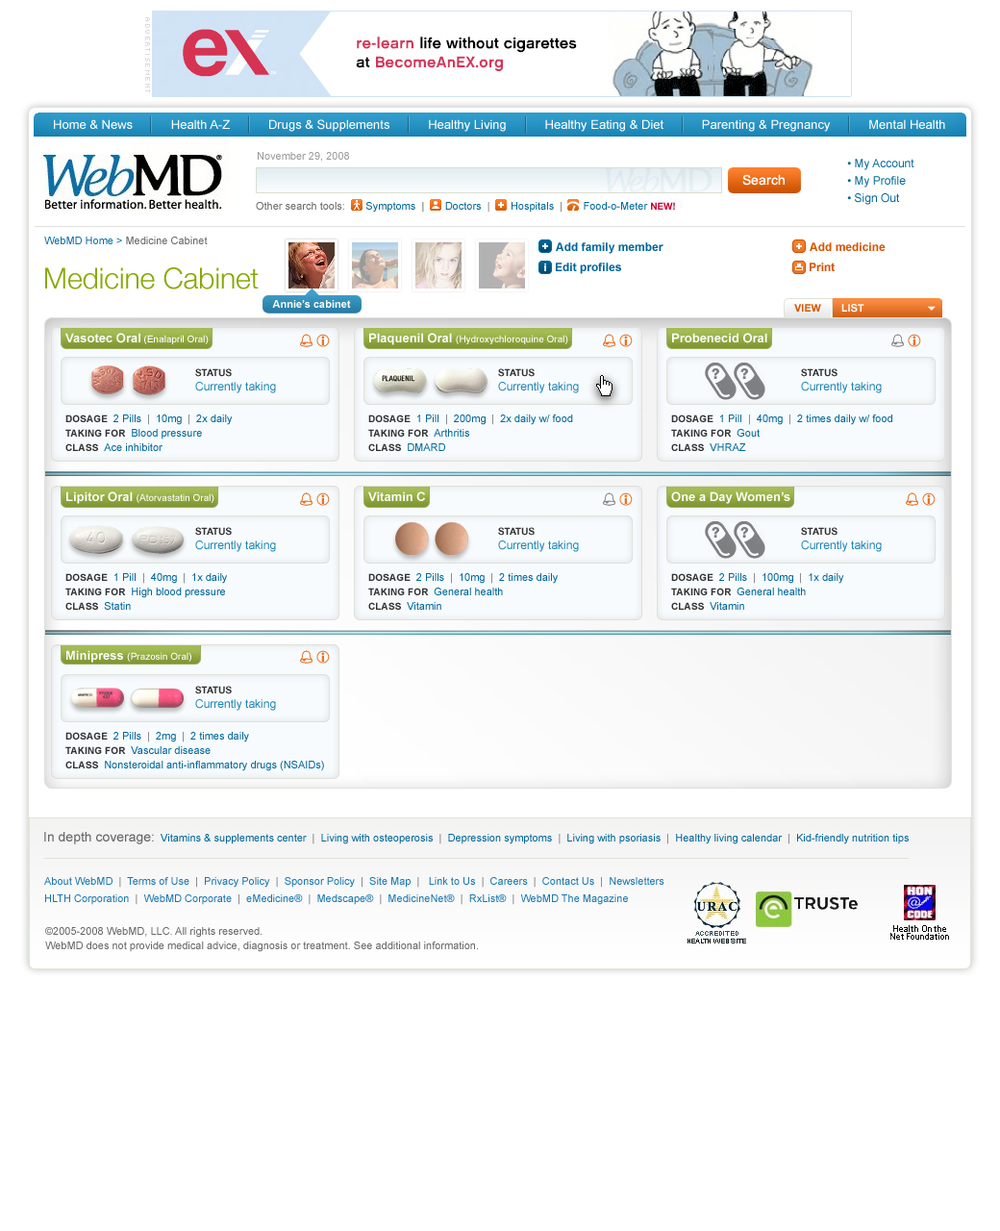 webmd_Page_21.jpg